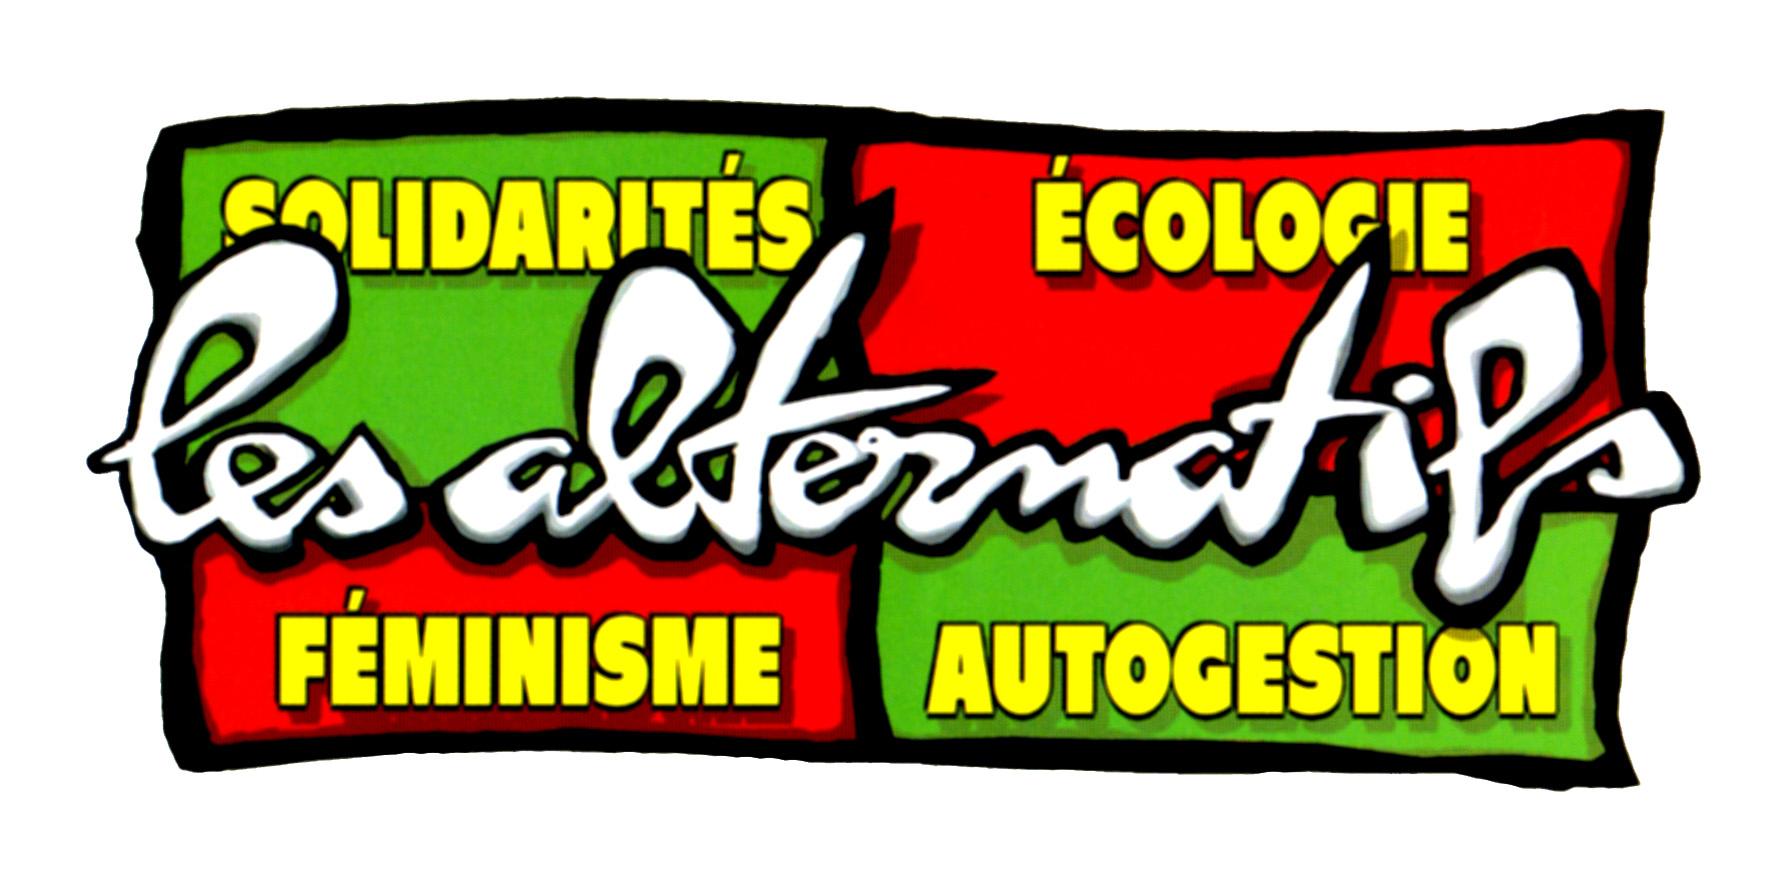 http://alternatifs38.free.fr/IMG/jpg/logo_alternatifs.jpg